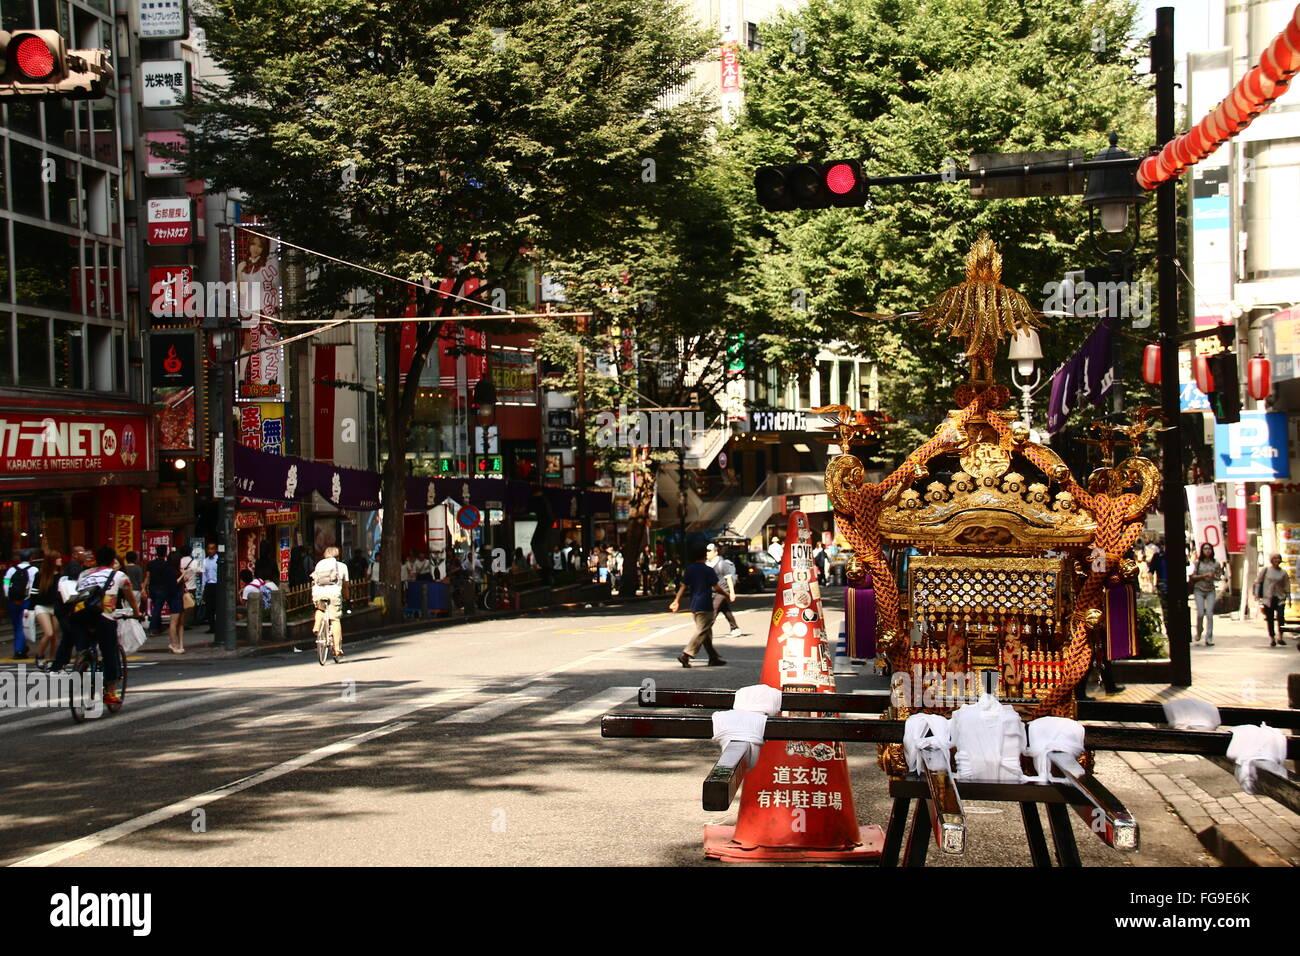 Mikoshi On City Street Against Trees - Stock Image